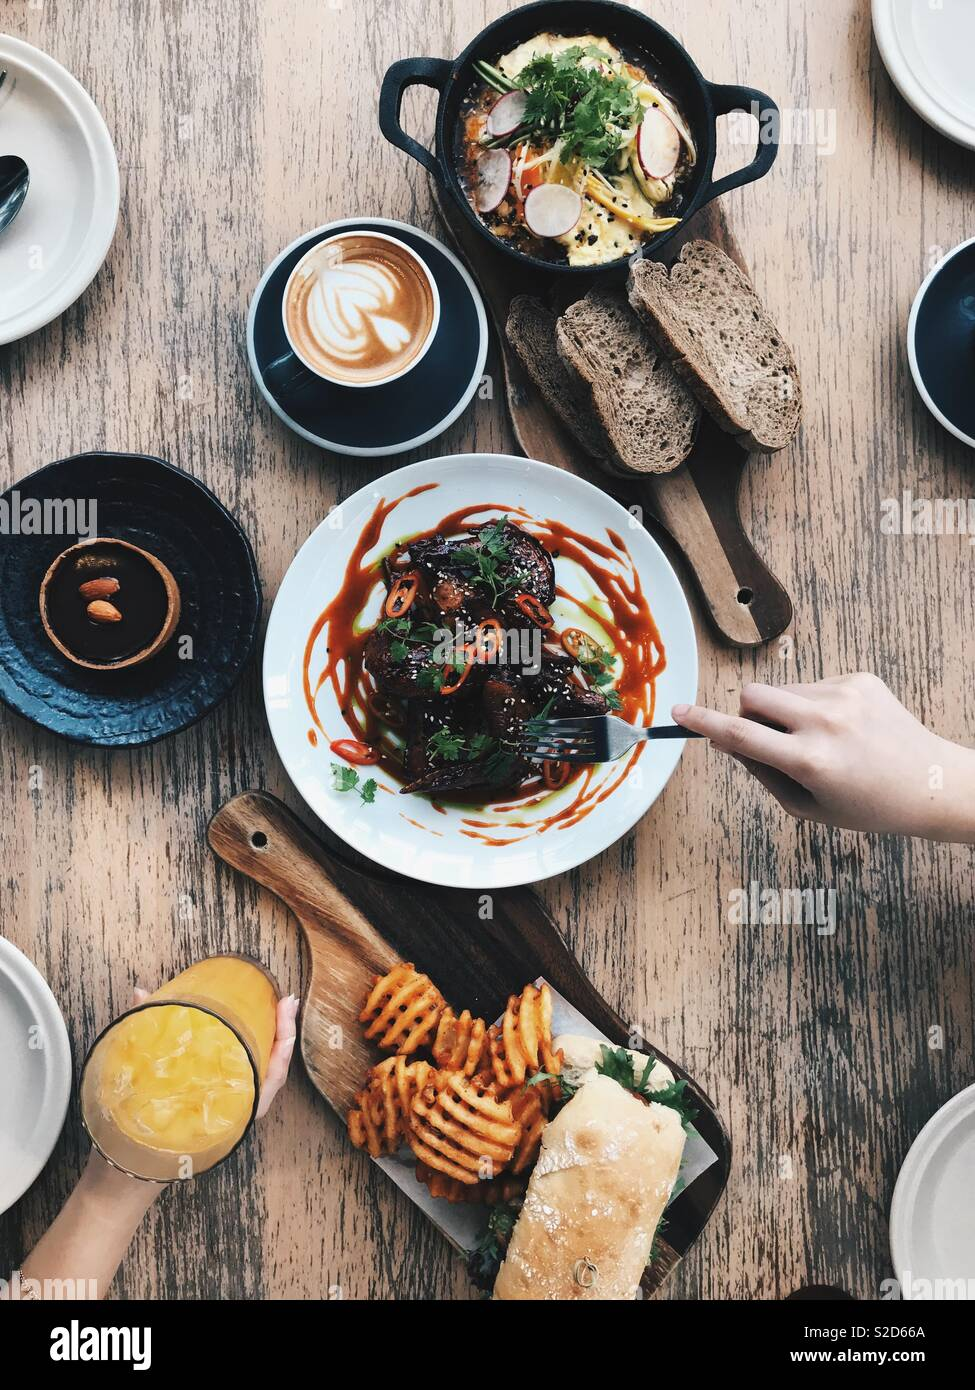 Food and coffee - Stock Image